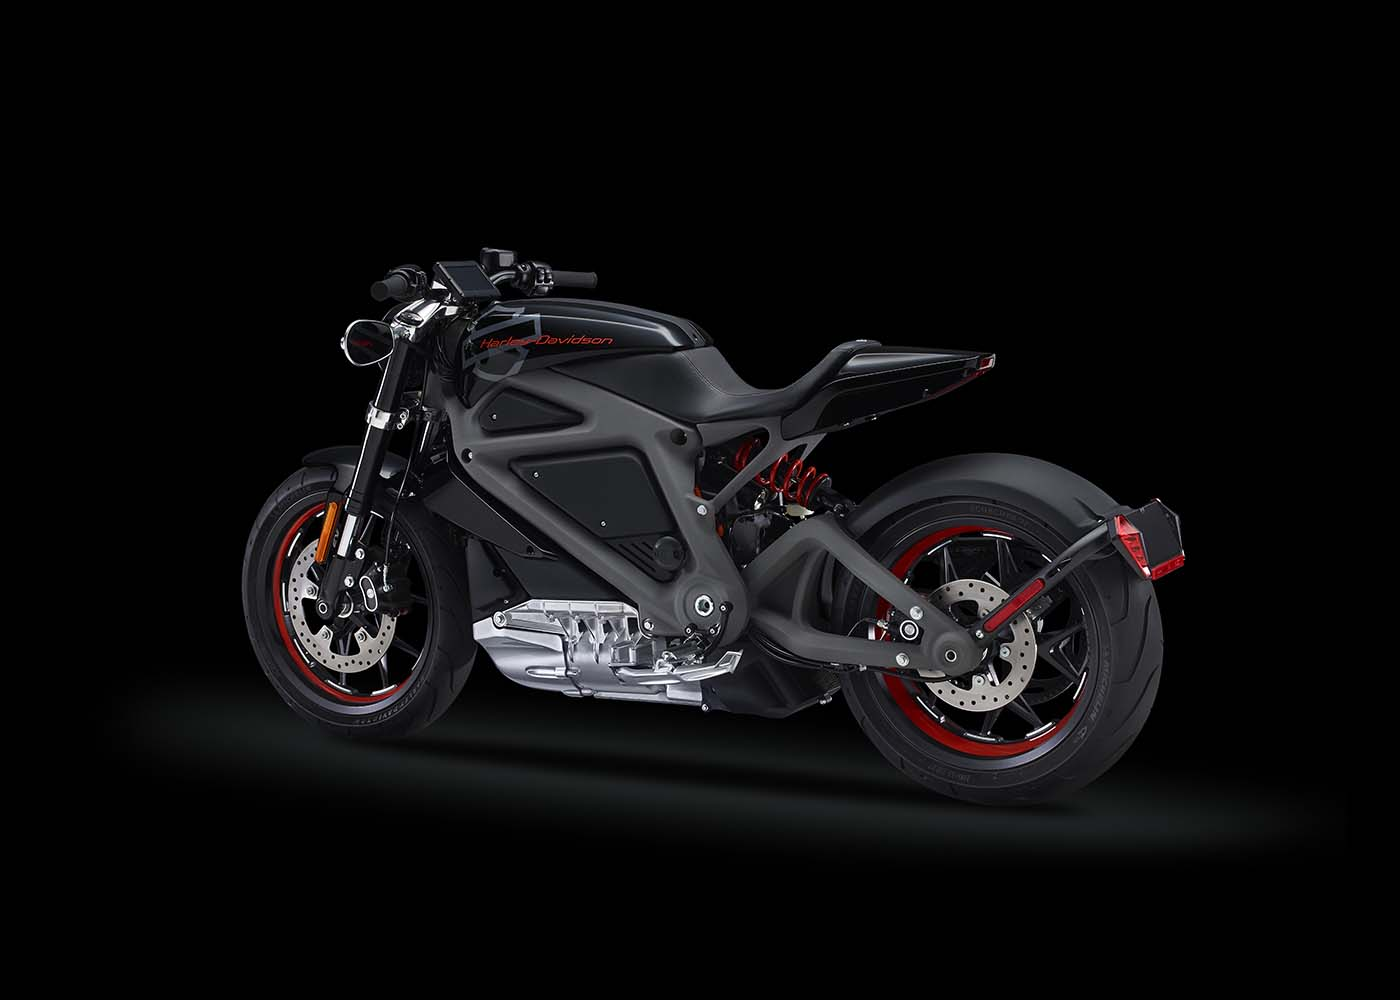 Leaked Tech Details On The Harley Davidson Livewire